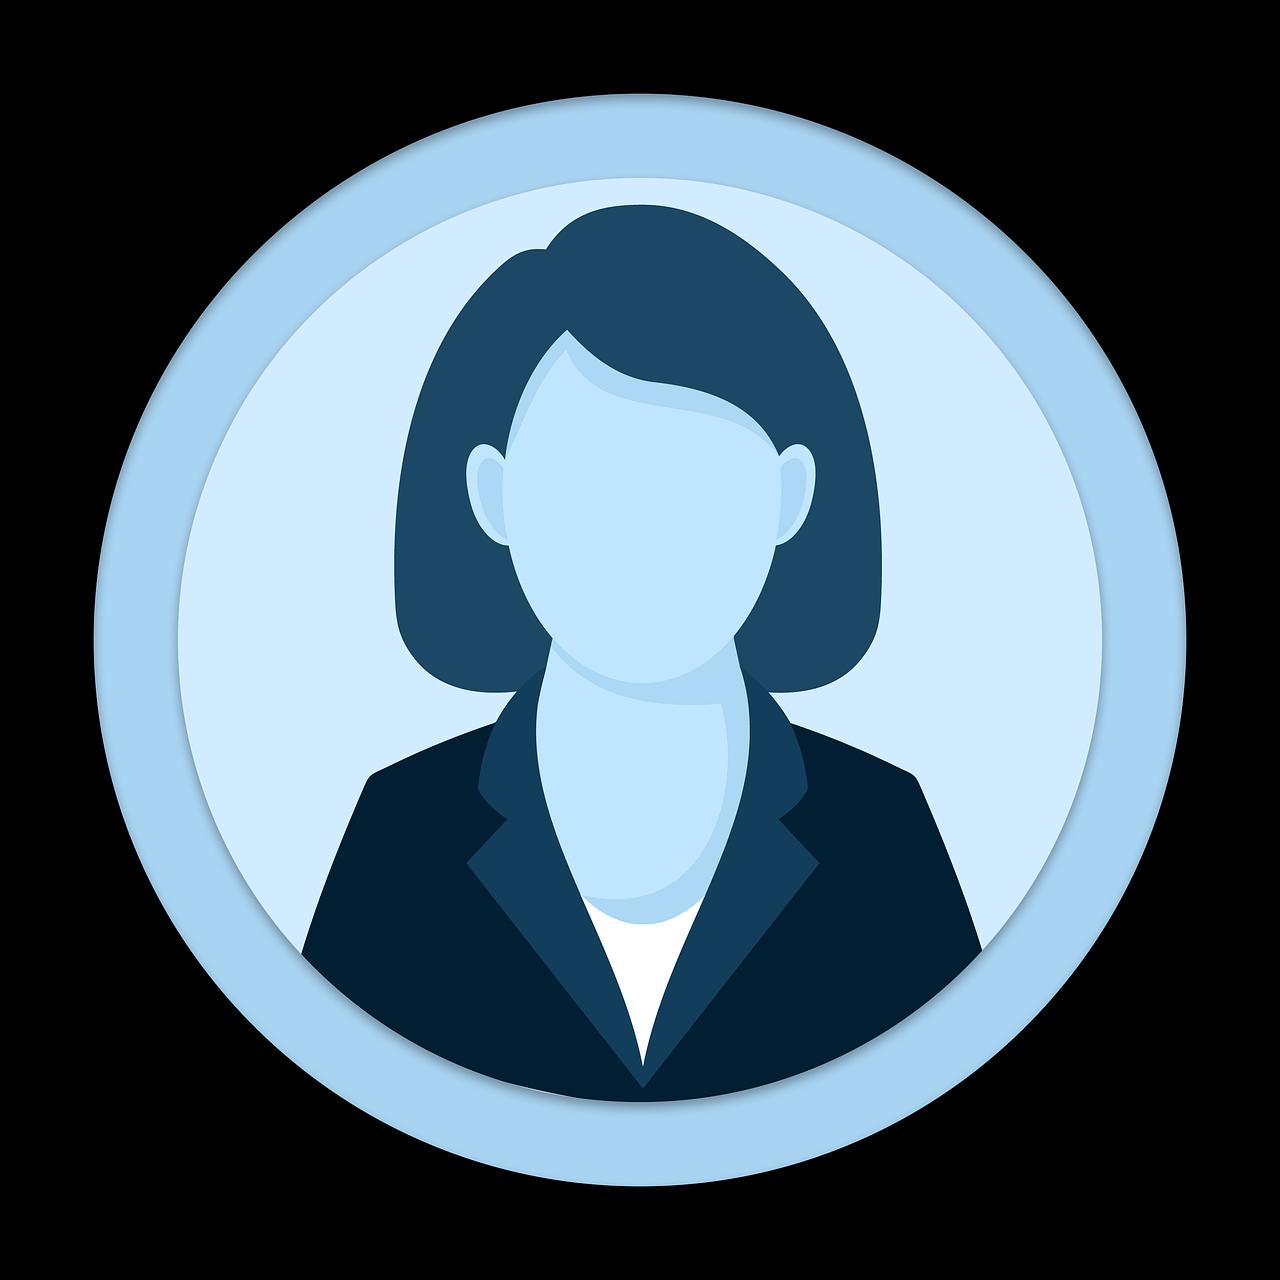 Картинки на иконку профиля